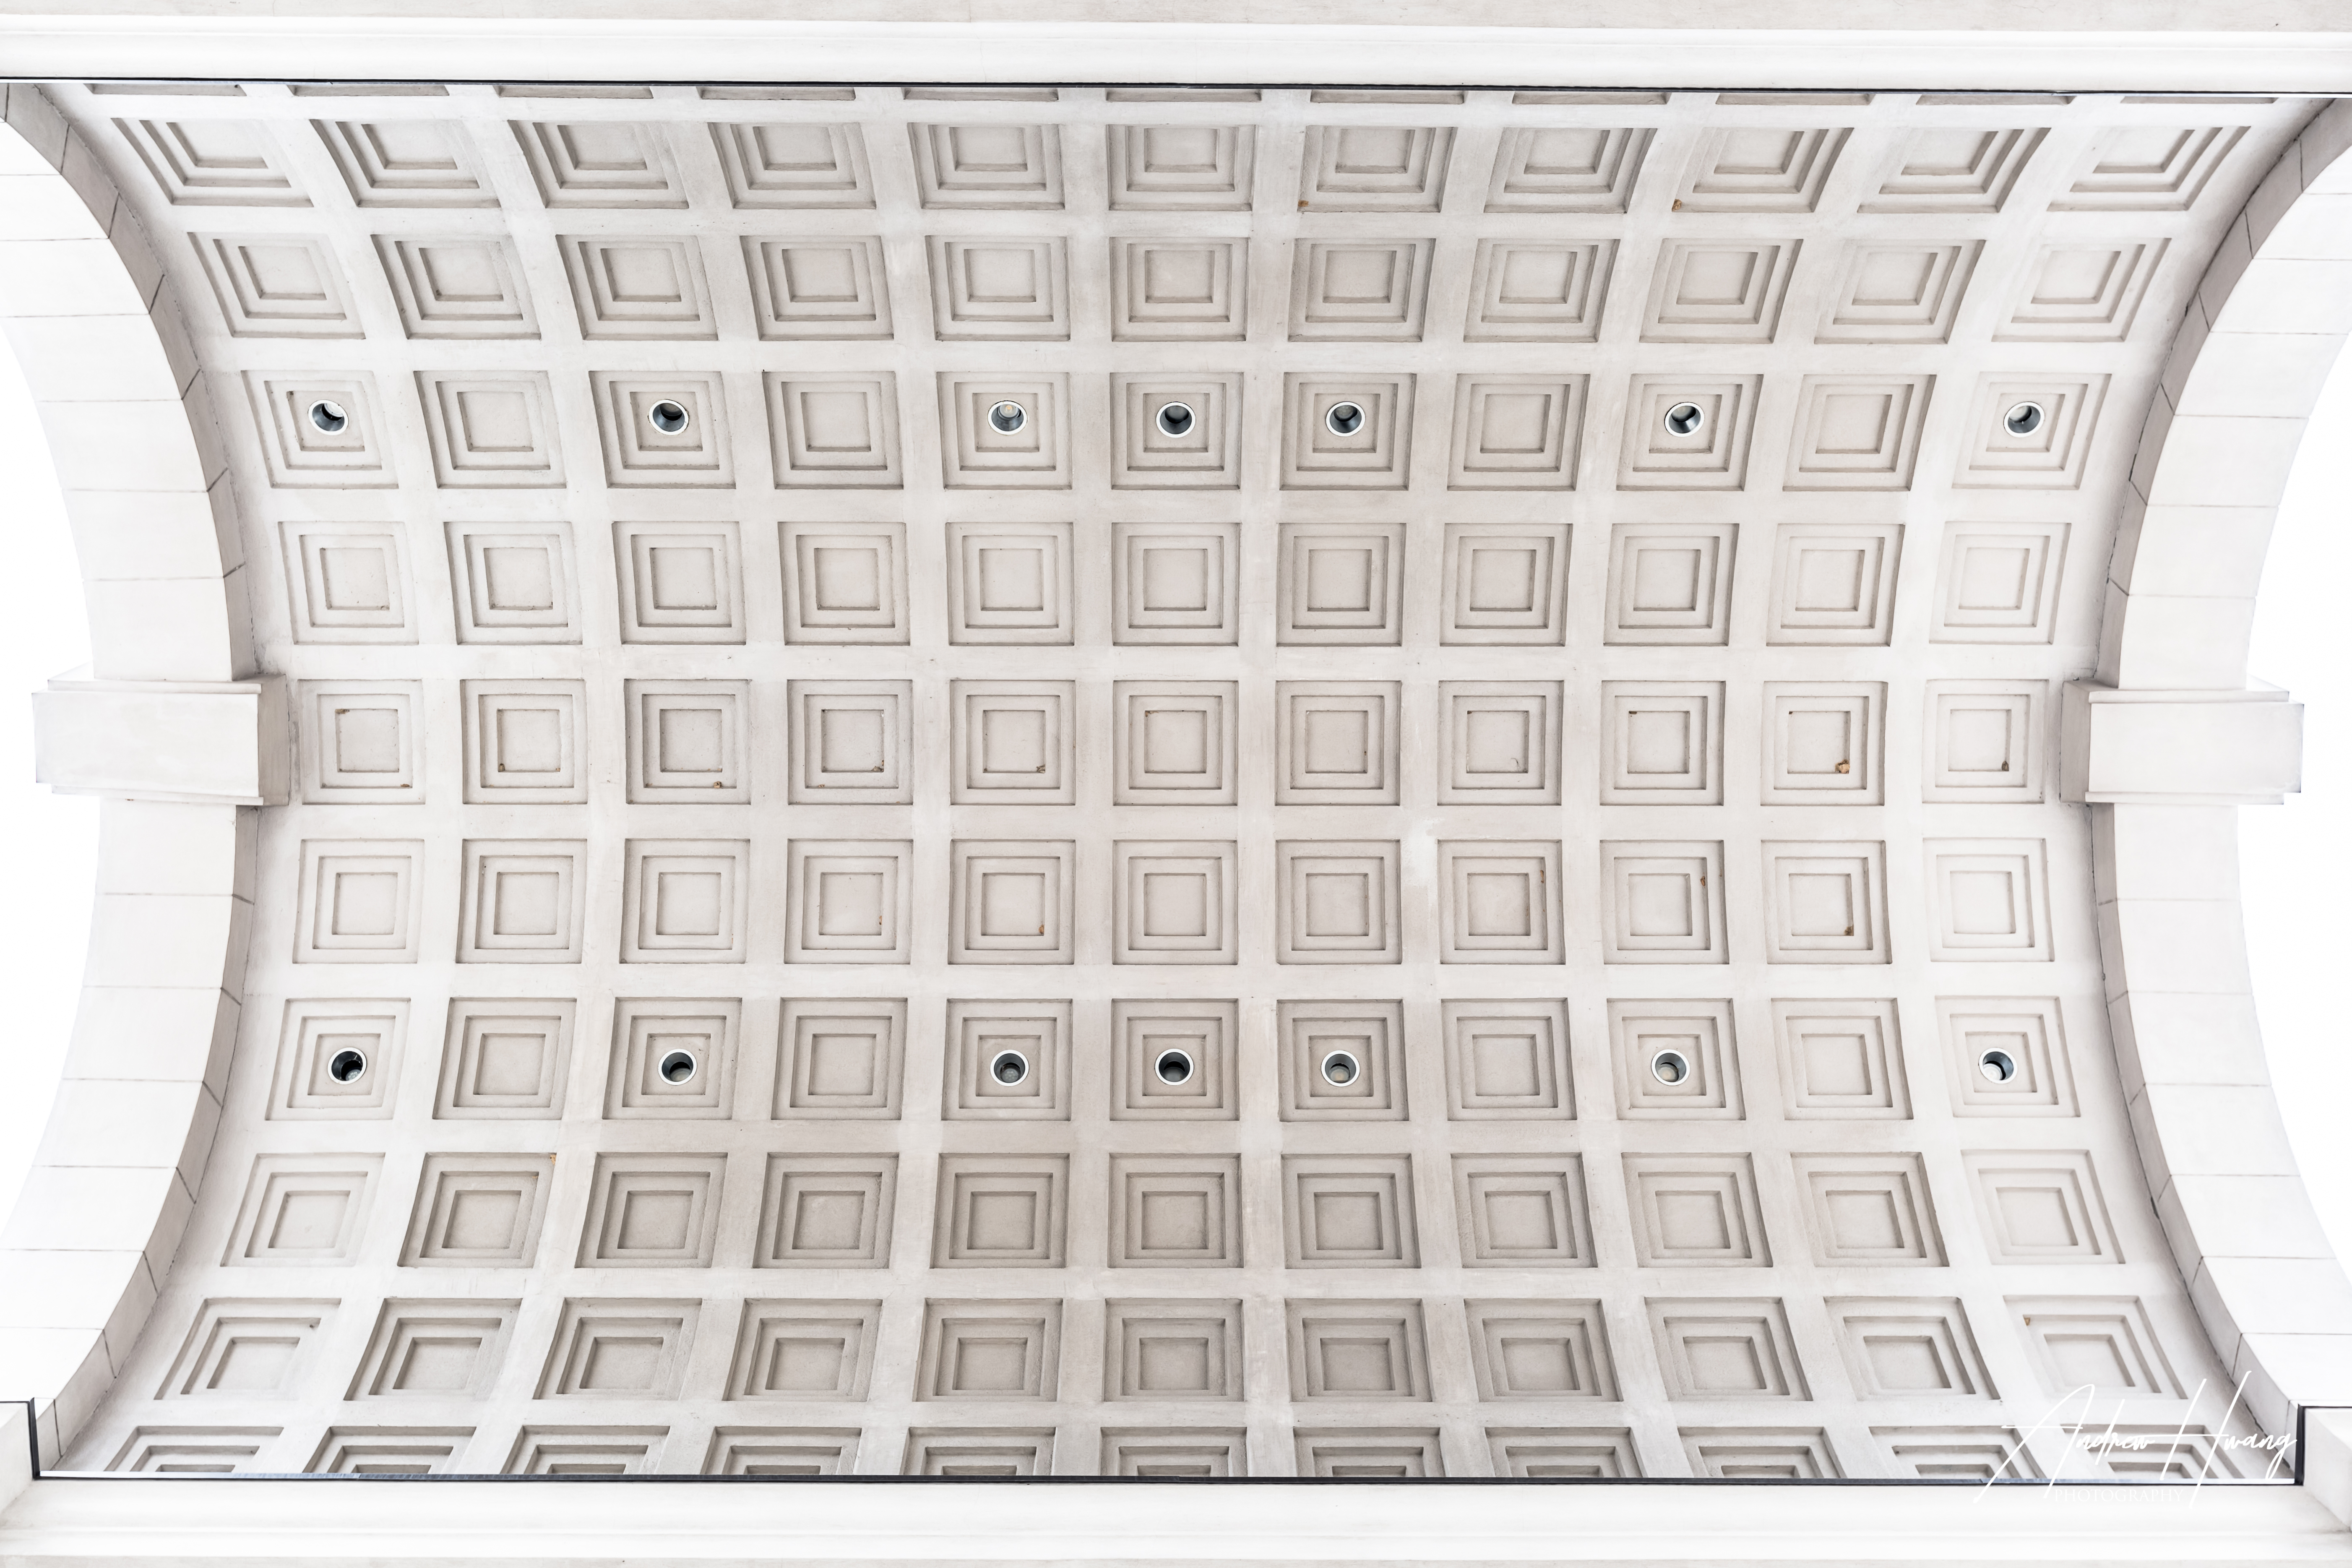 Atlanta - Millennium Gate Arch Ceiling